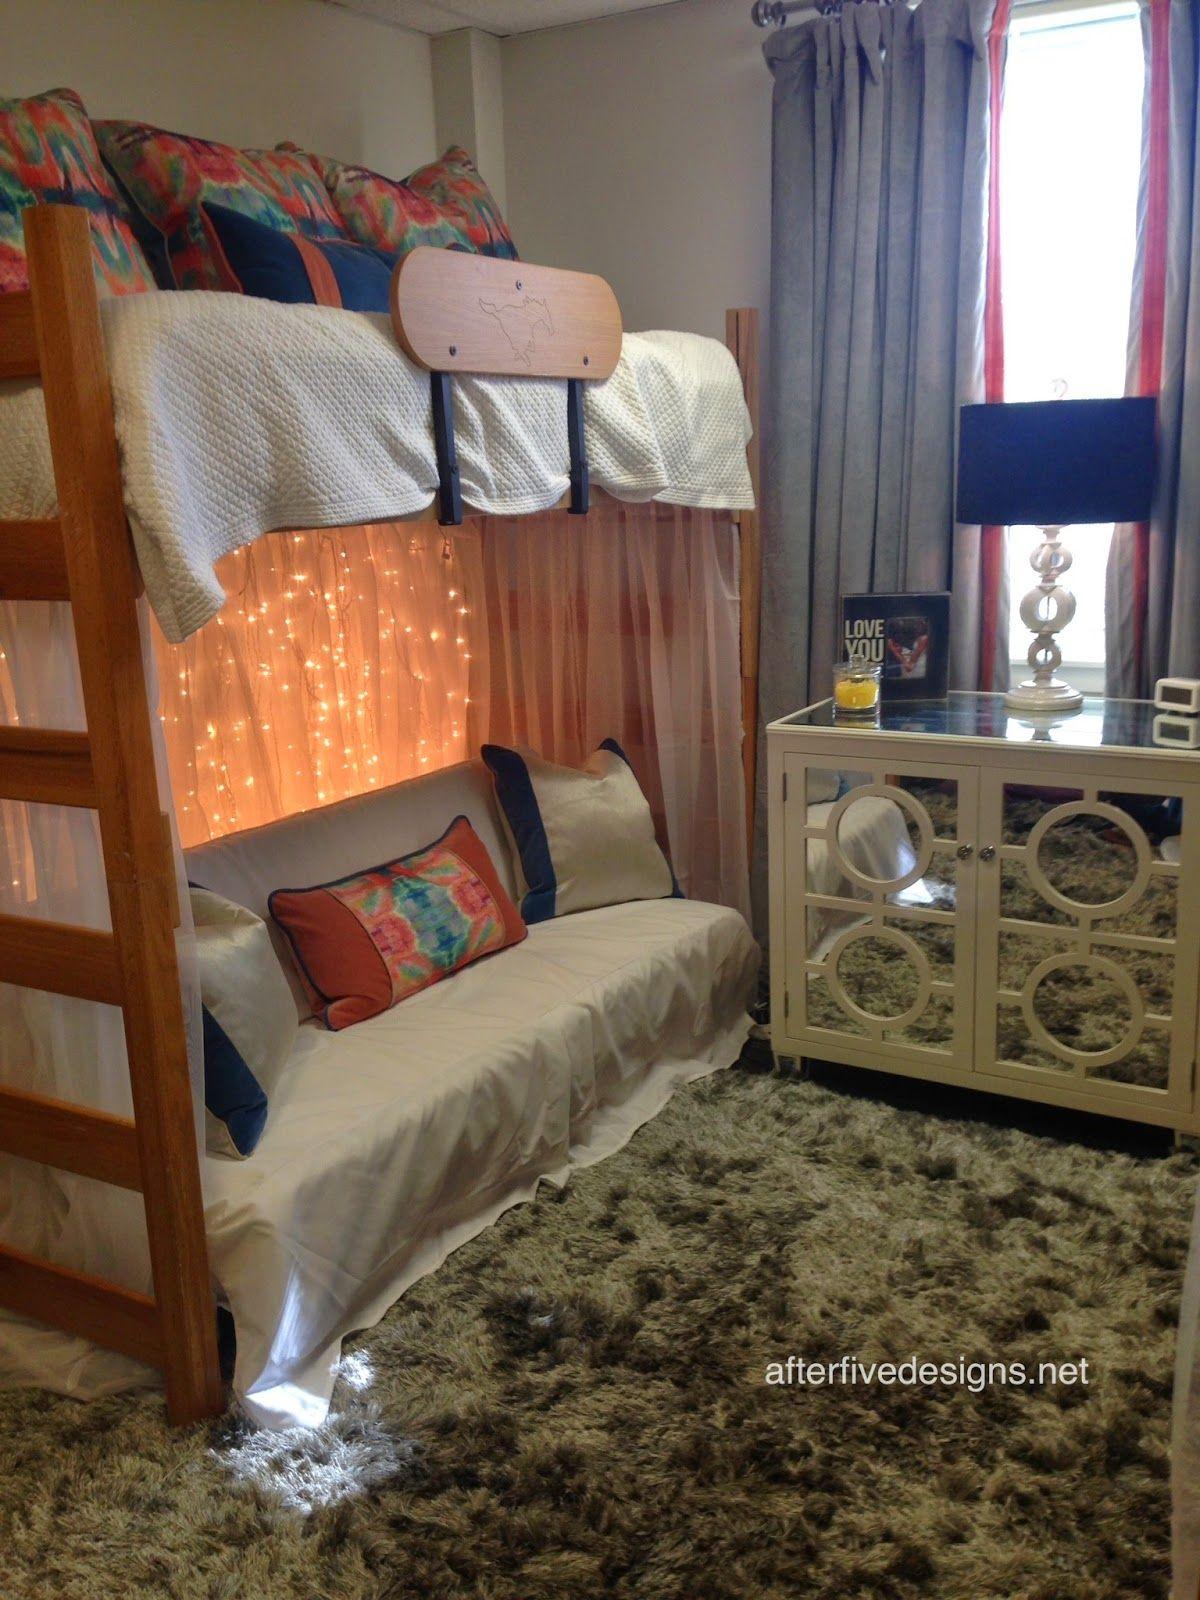 SMU Dorm Room Dorm Rooms 2014 College Stuff